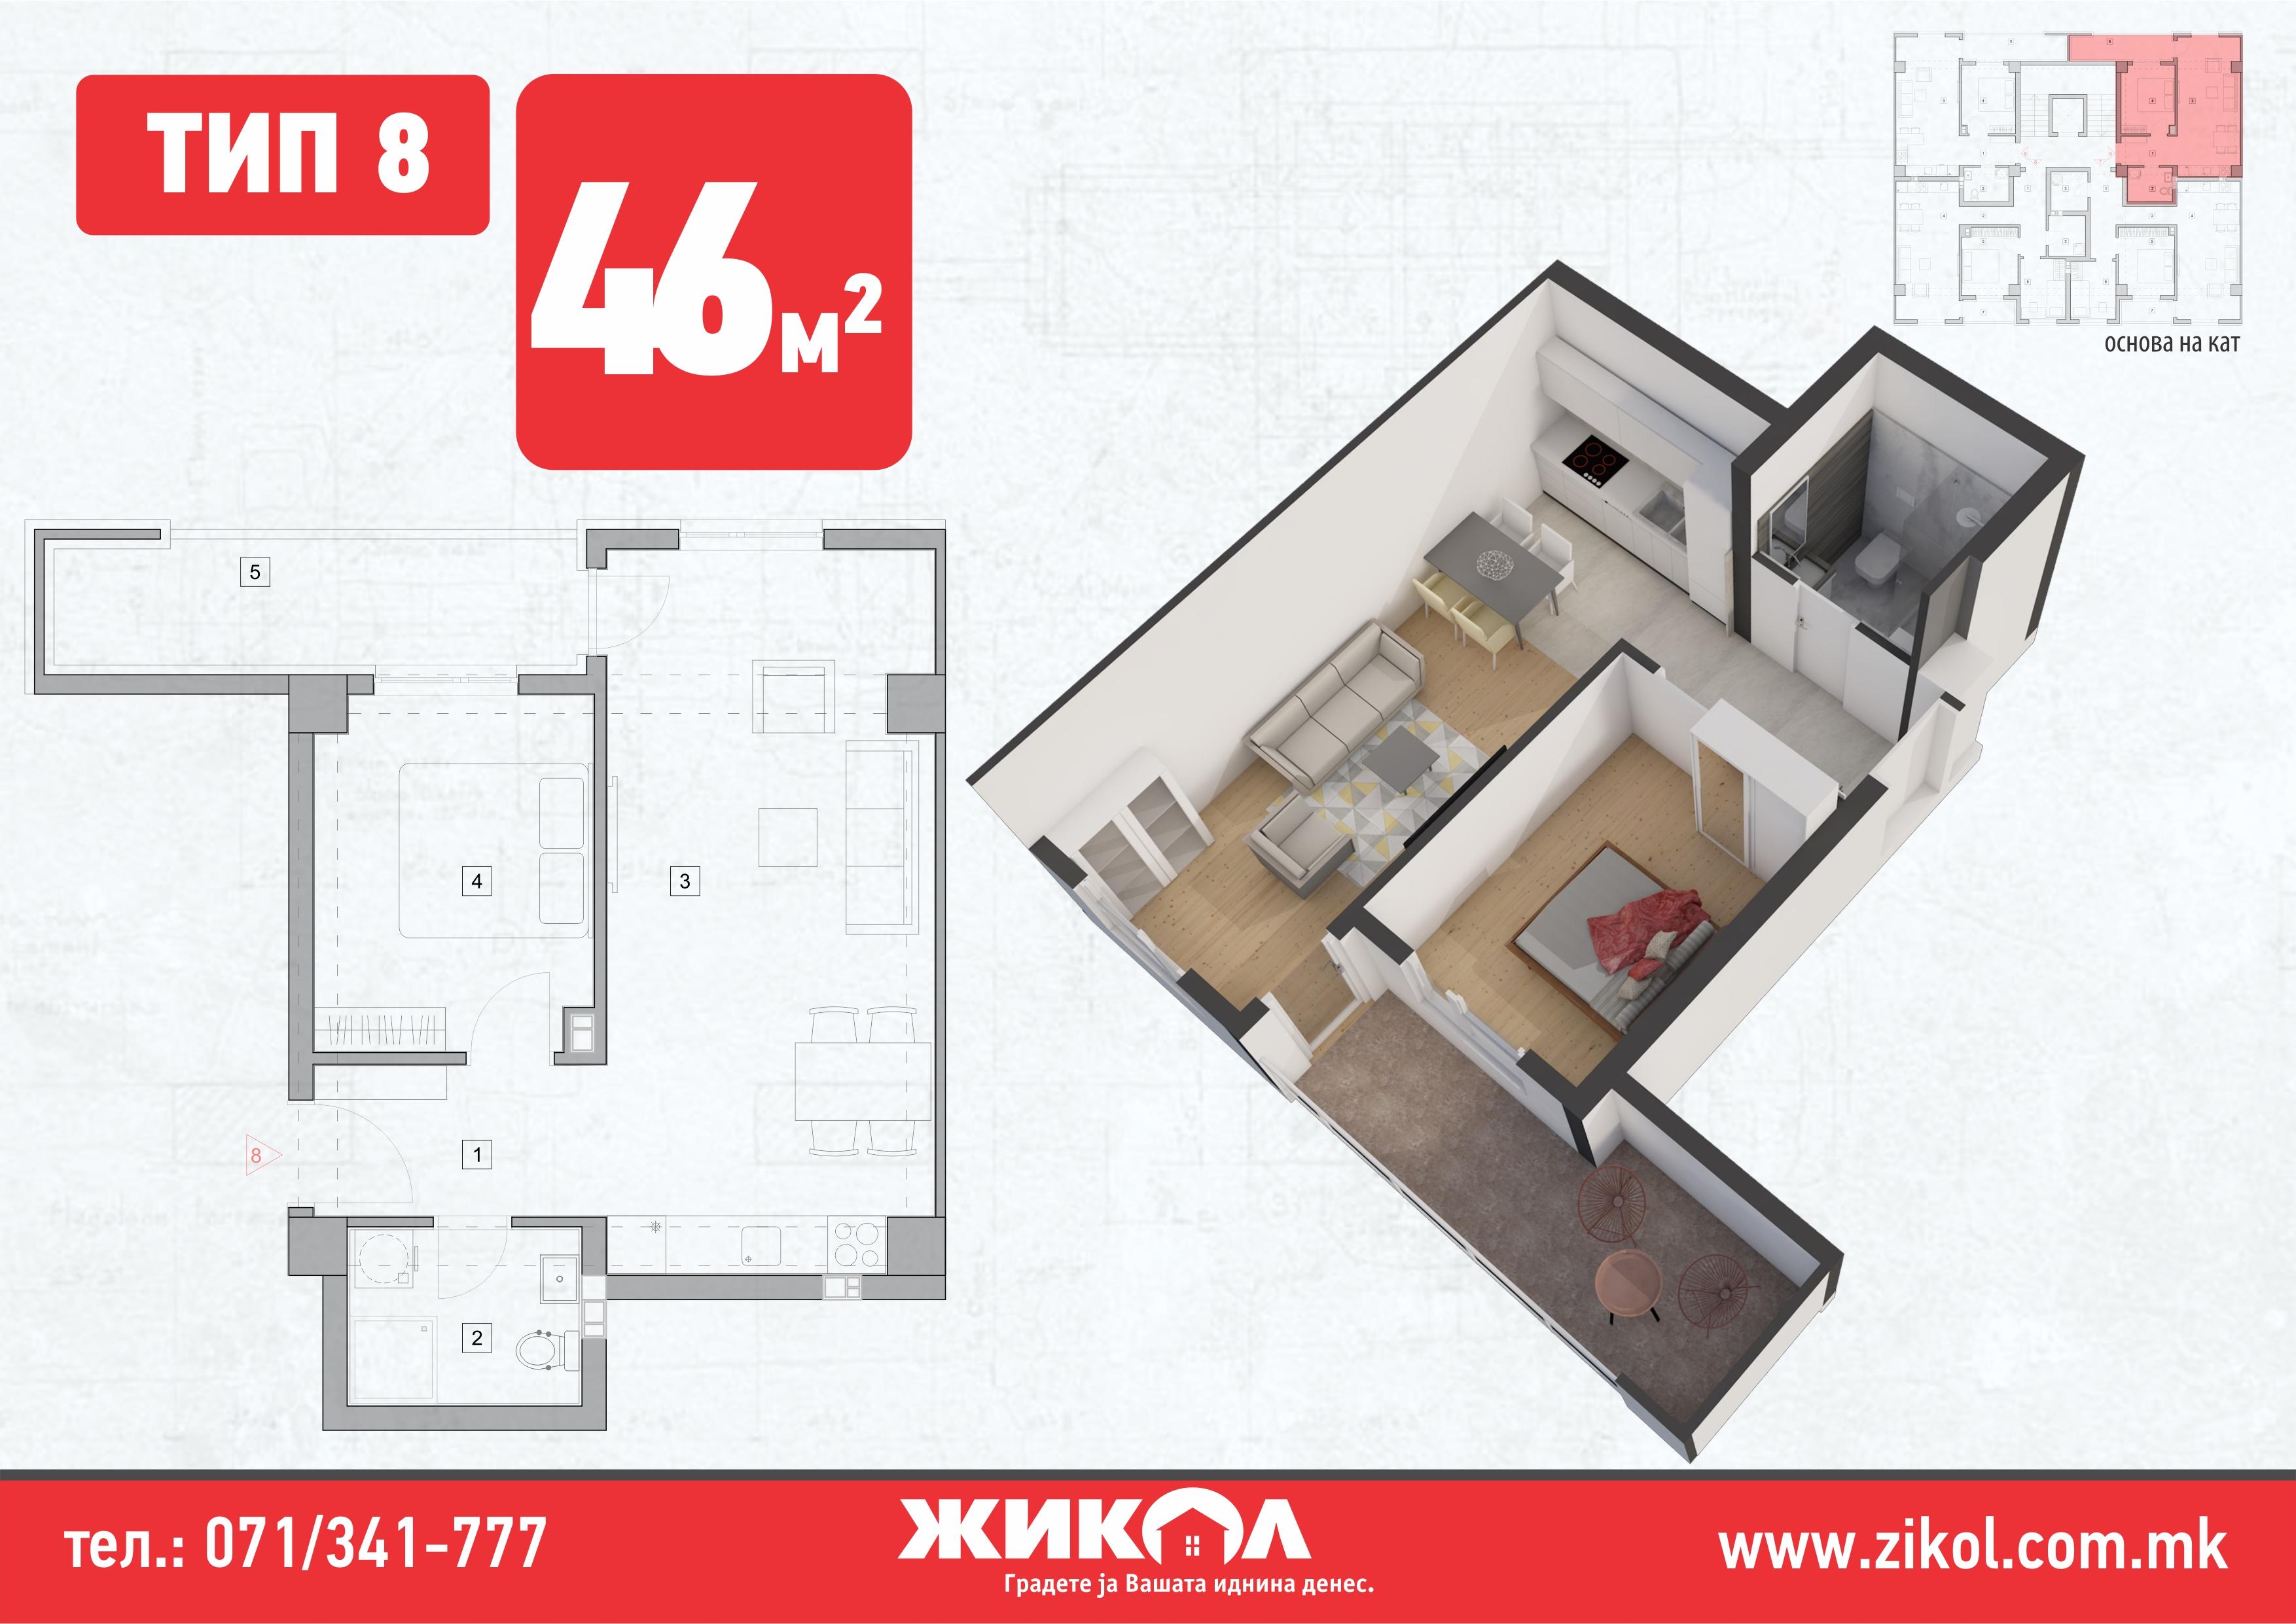 зграда 8, кат 4, стан 20